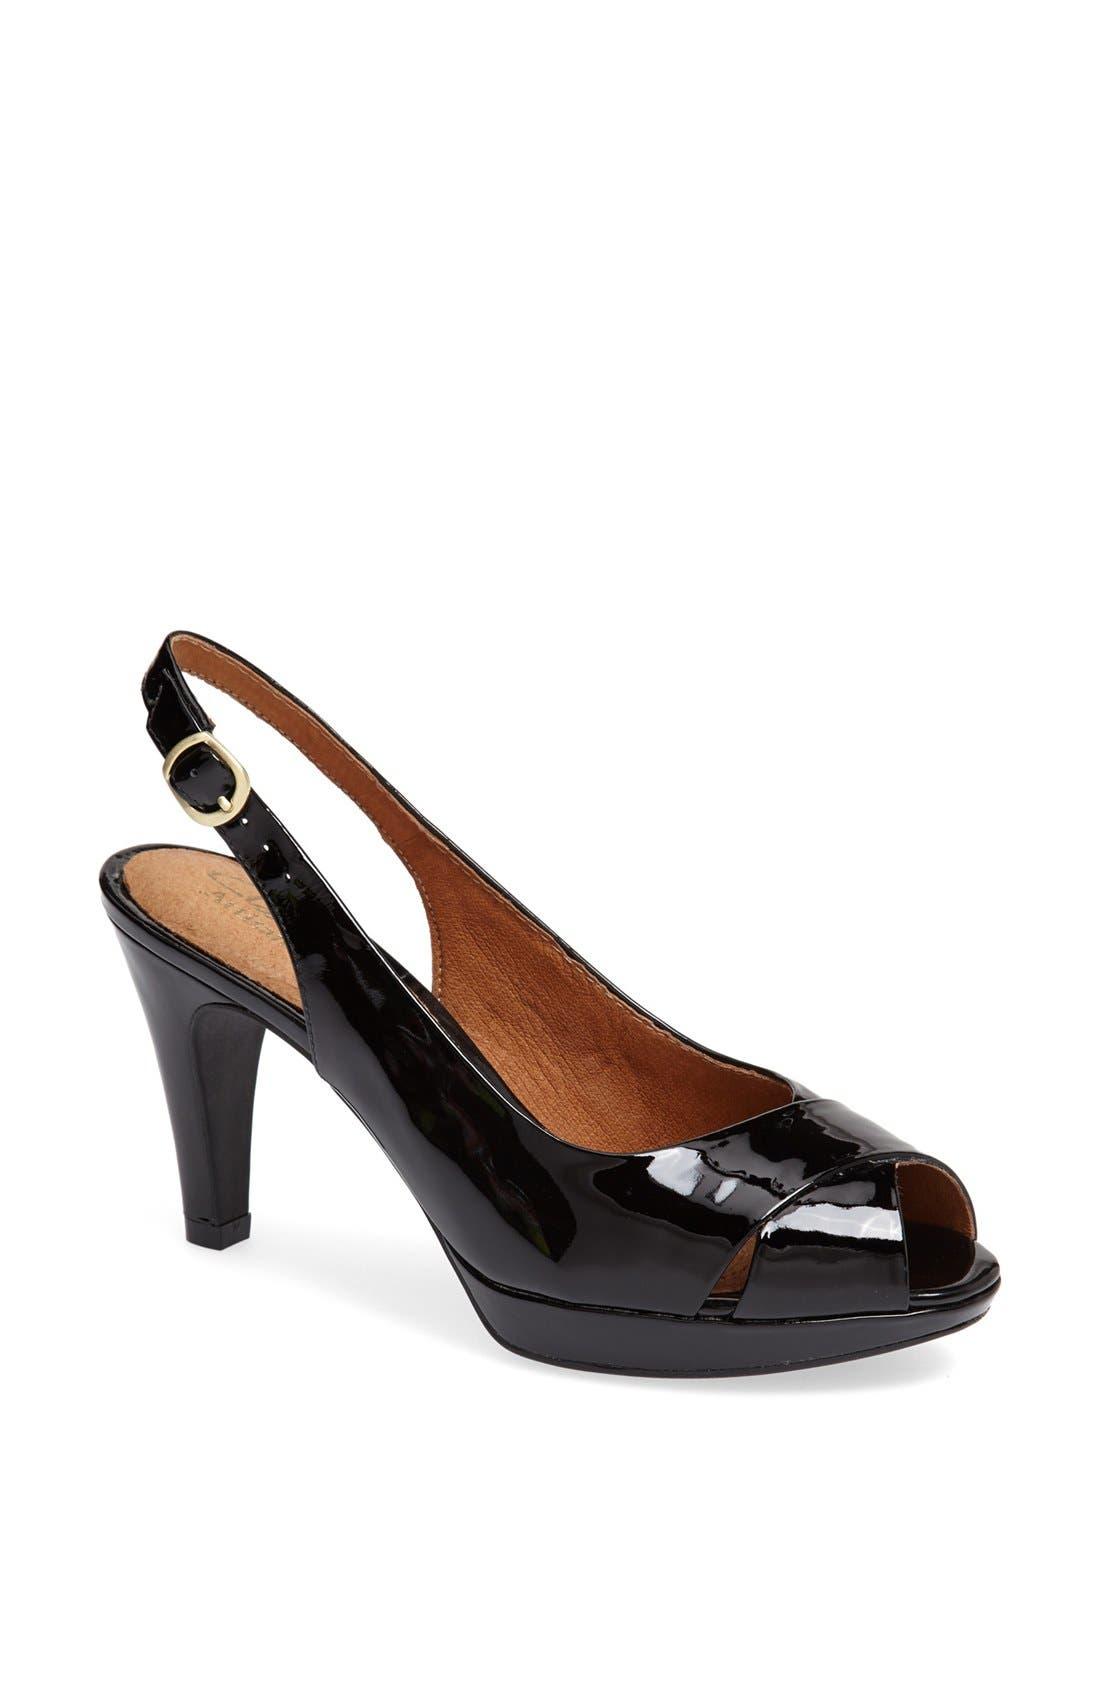 Main Image - Clarks® 'Wessex Bria' Sandal